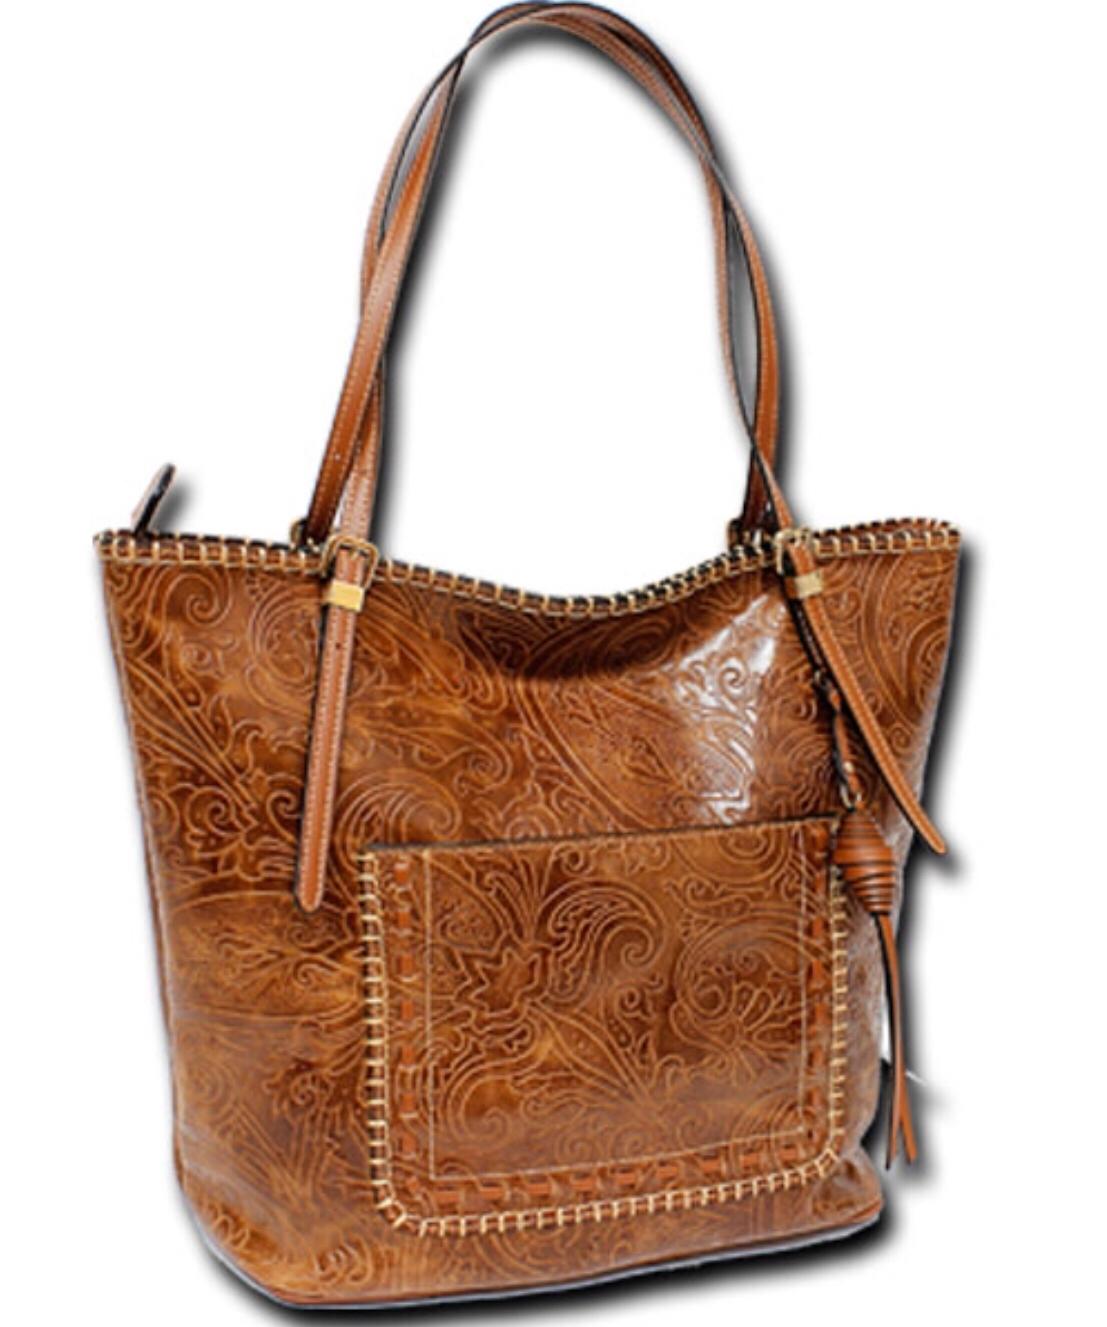 02af6c380b Tooled Leather Handbag by MC Handbags